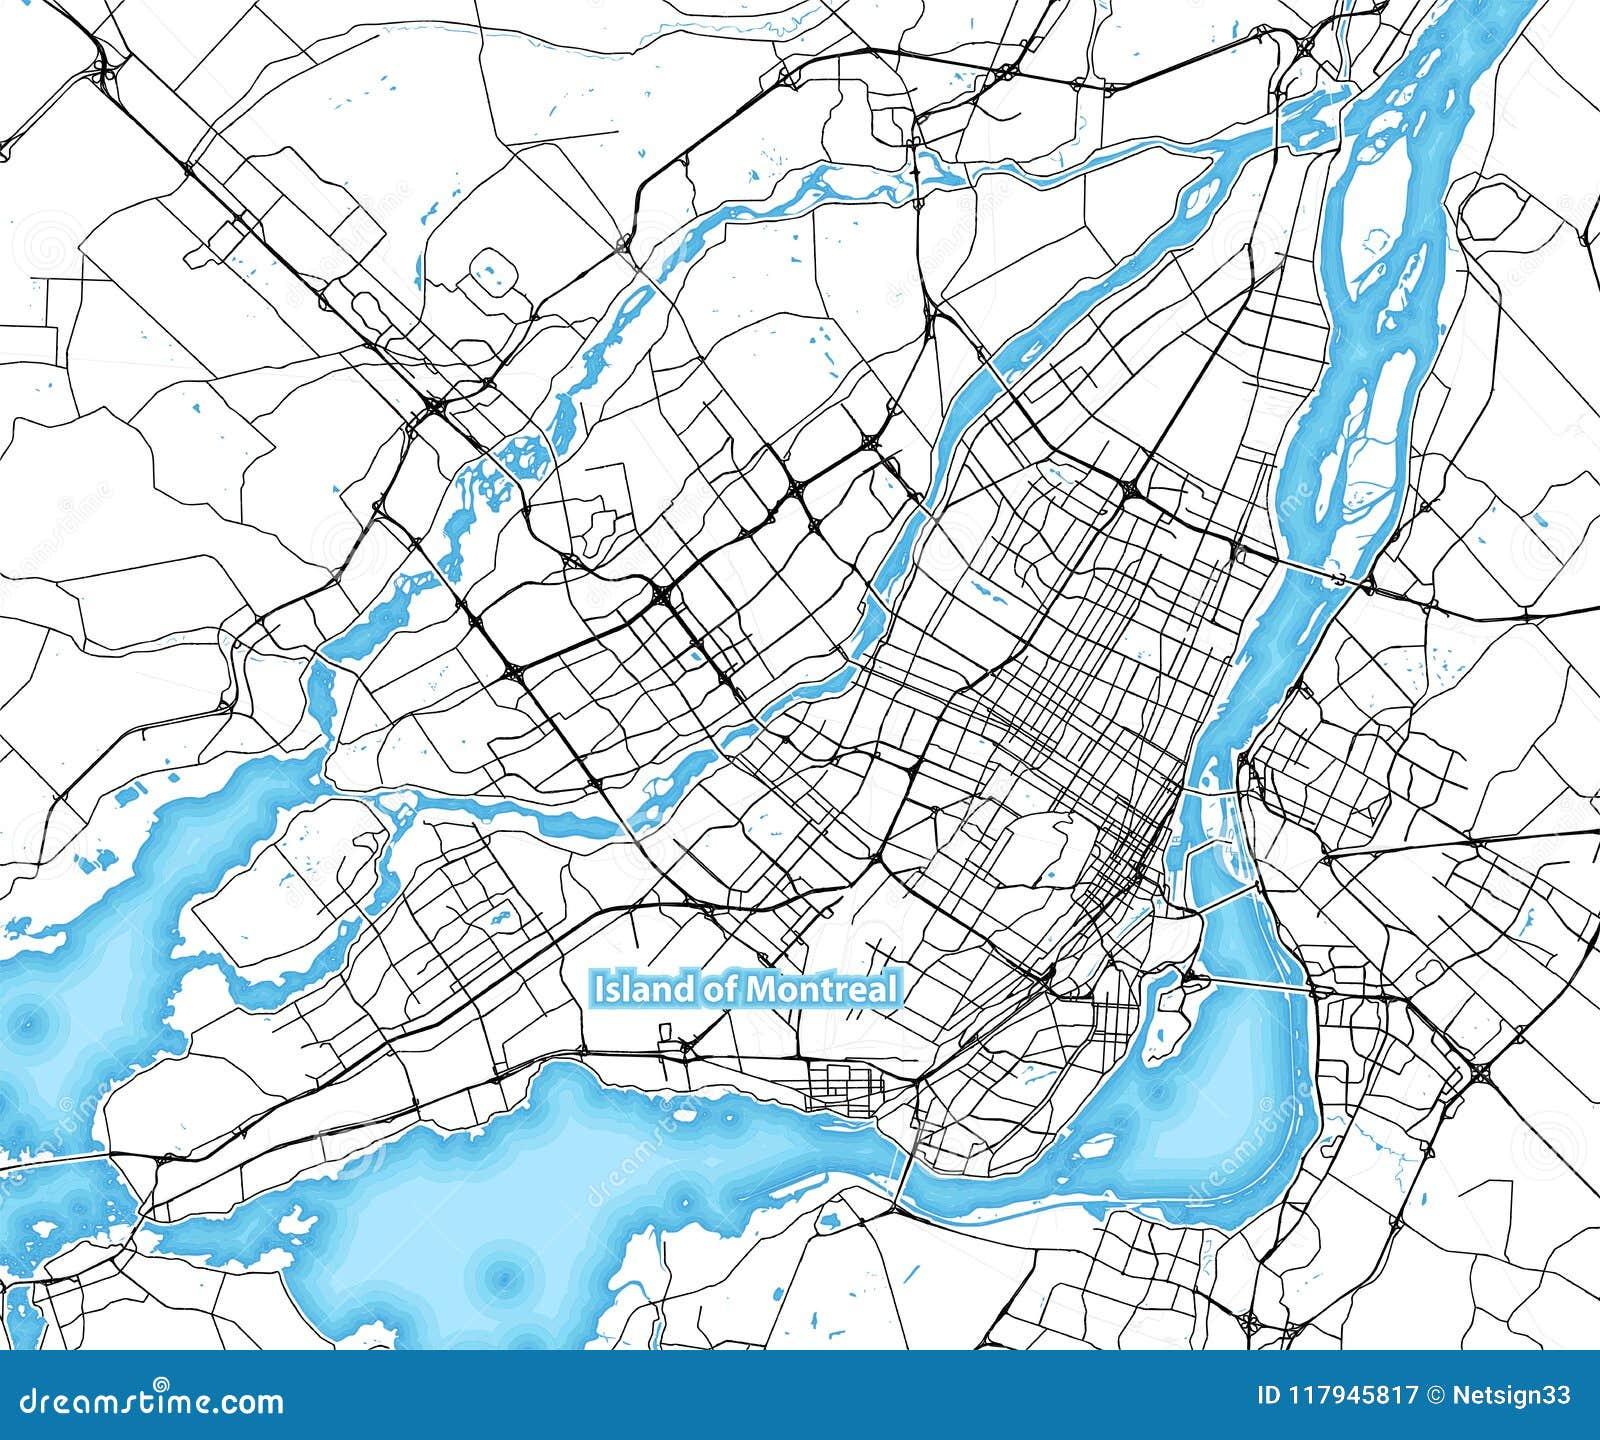 Carte Du Canada Montreal.Carte De L Ile De Montreal Canada Illustration De Vecteur